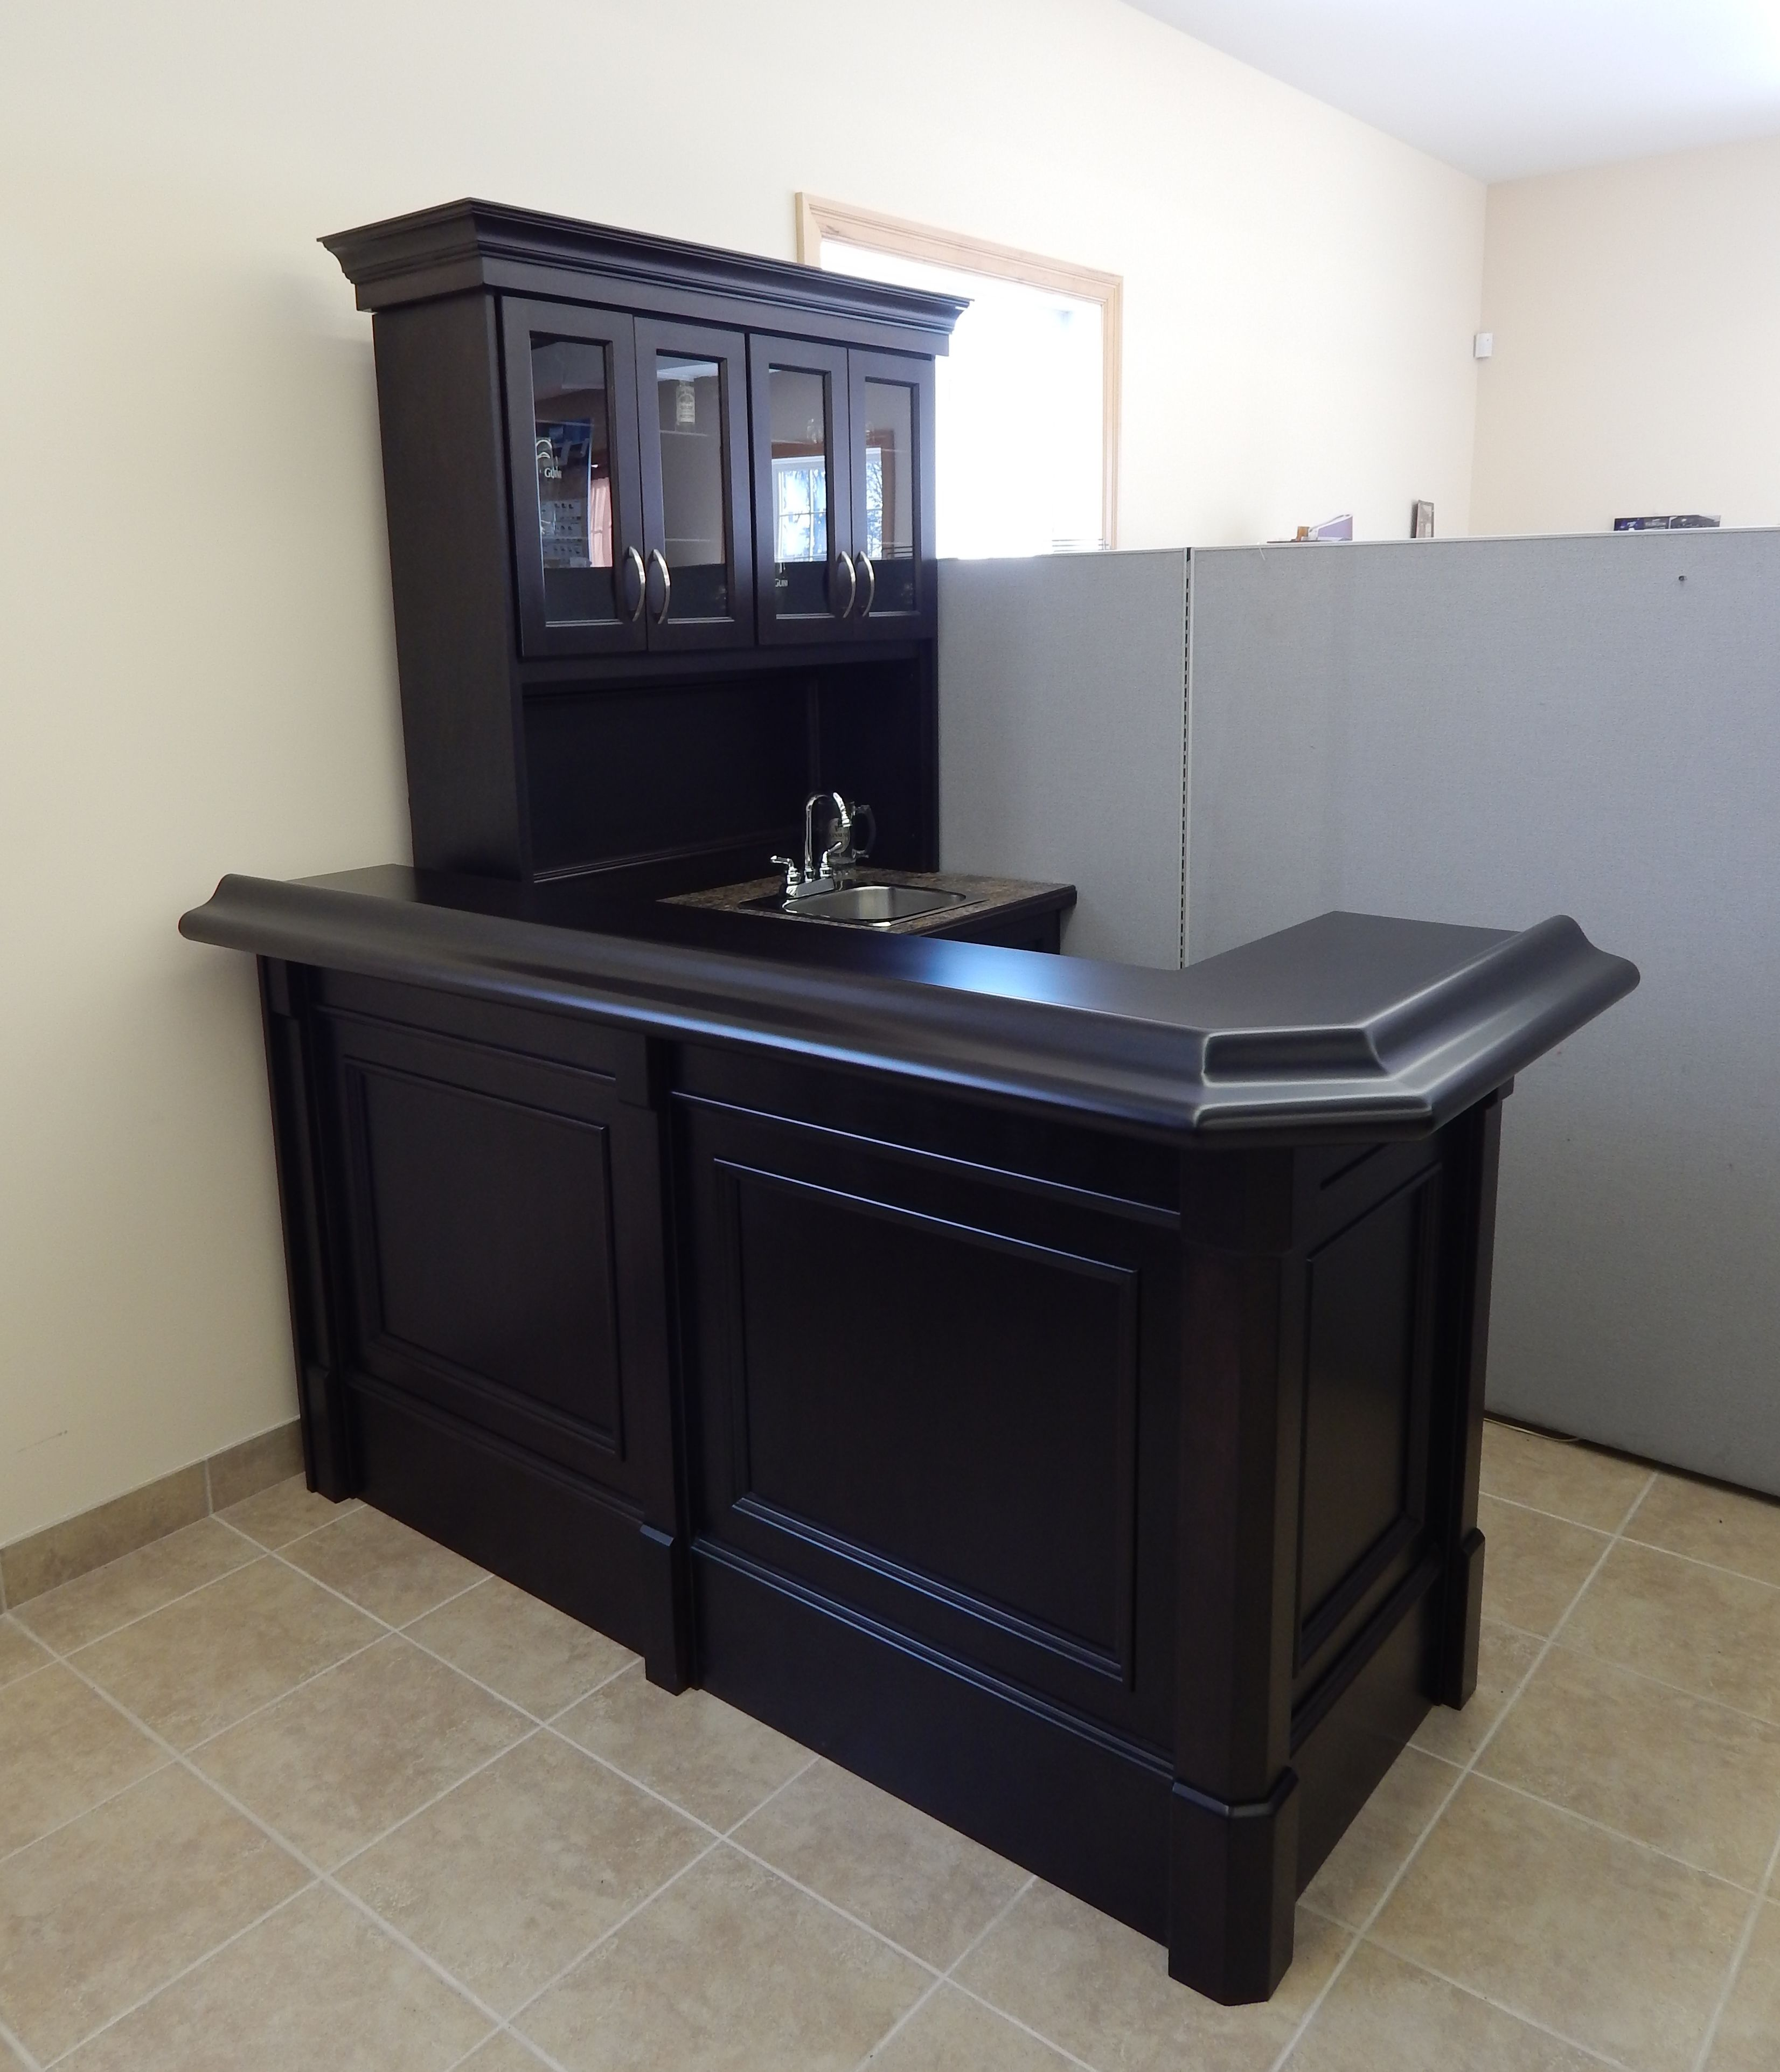 Custom Basement Bar With Sink And Upper Unit